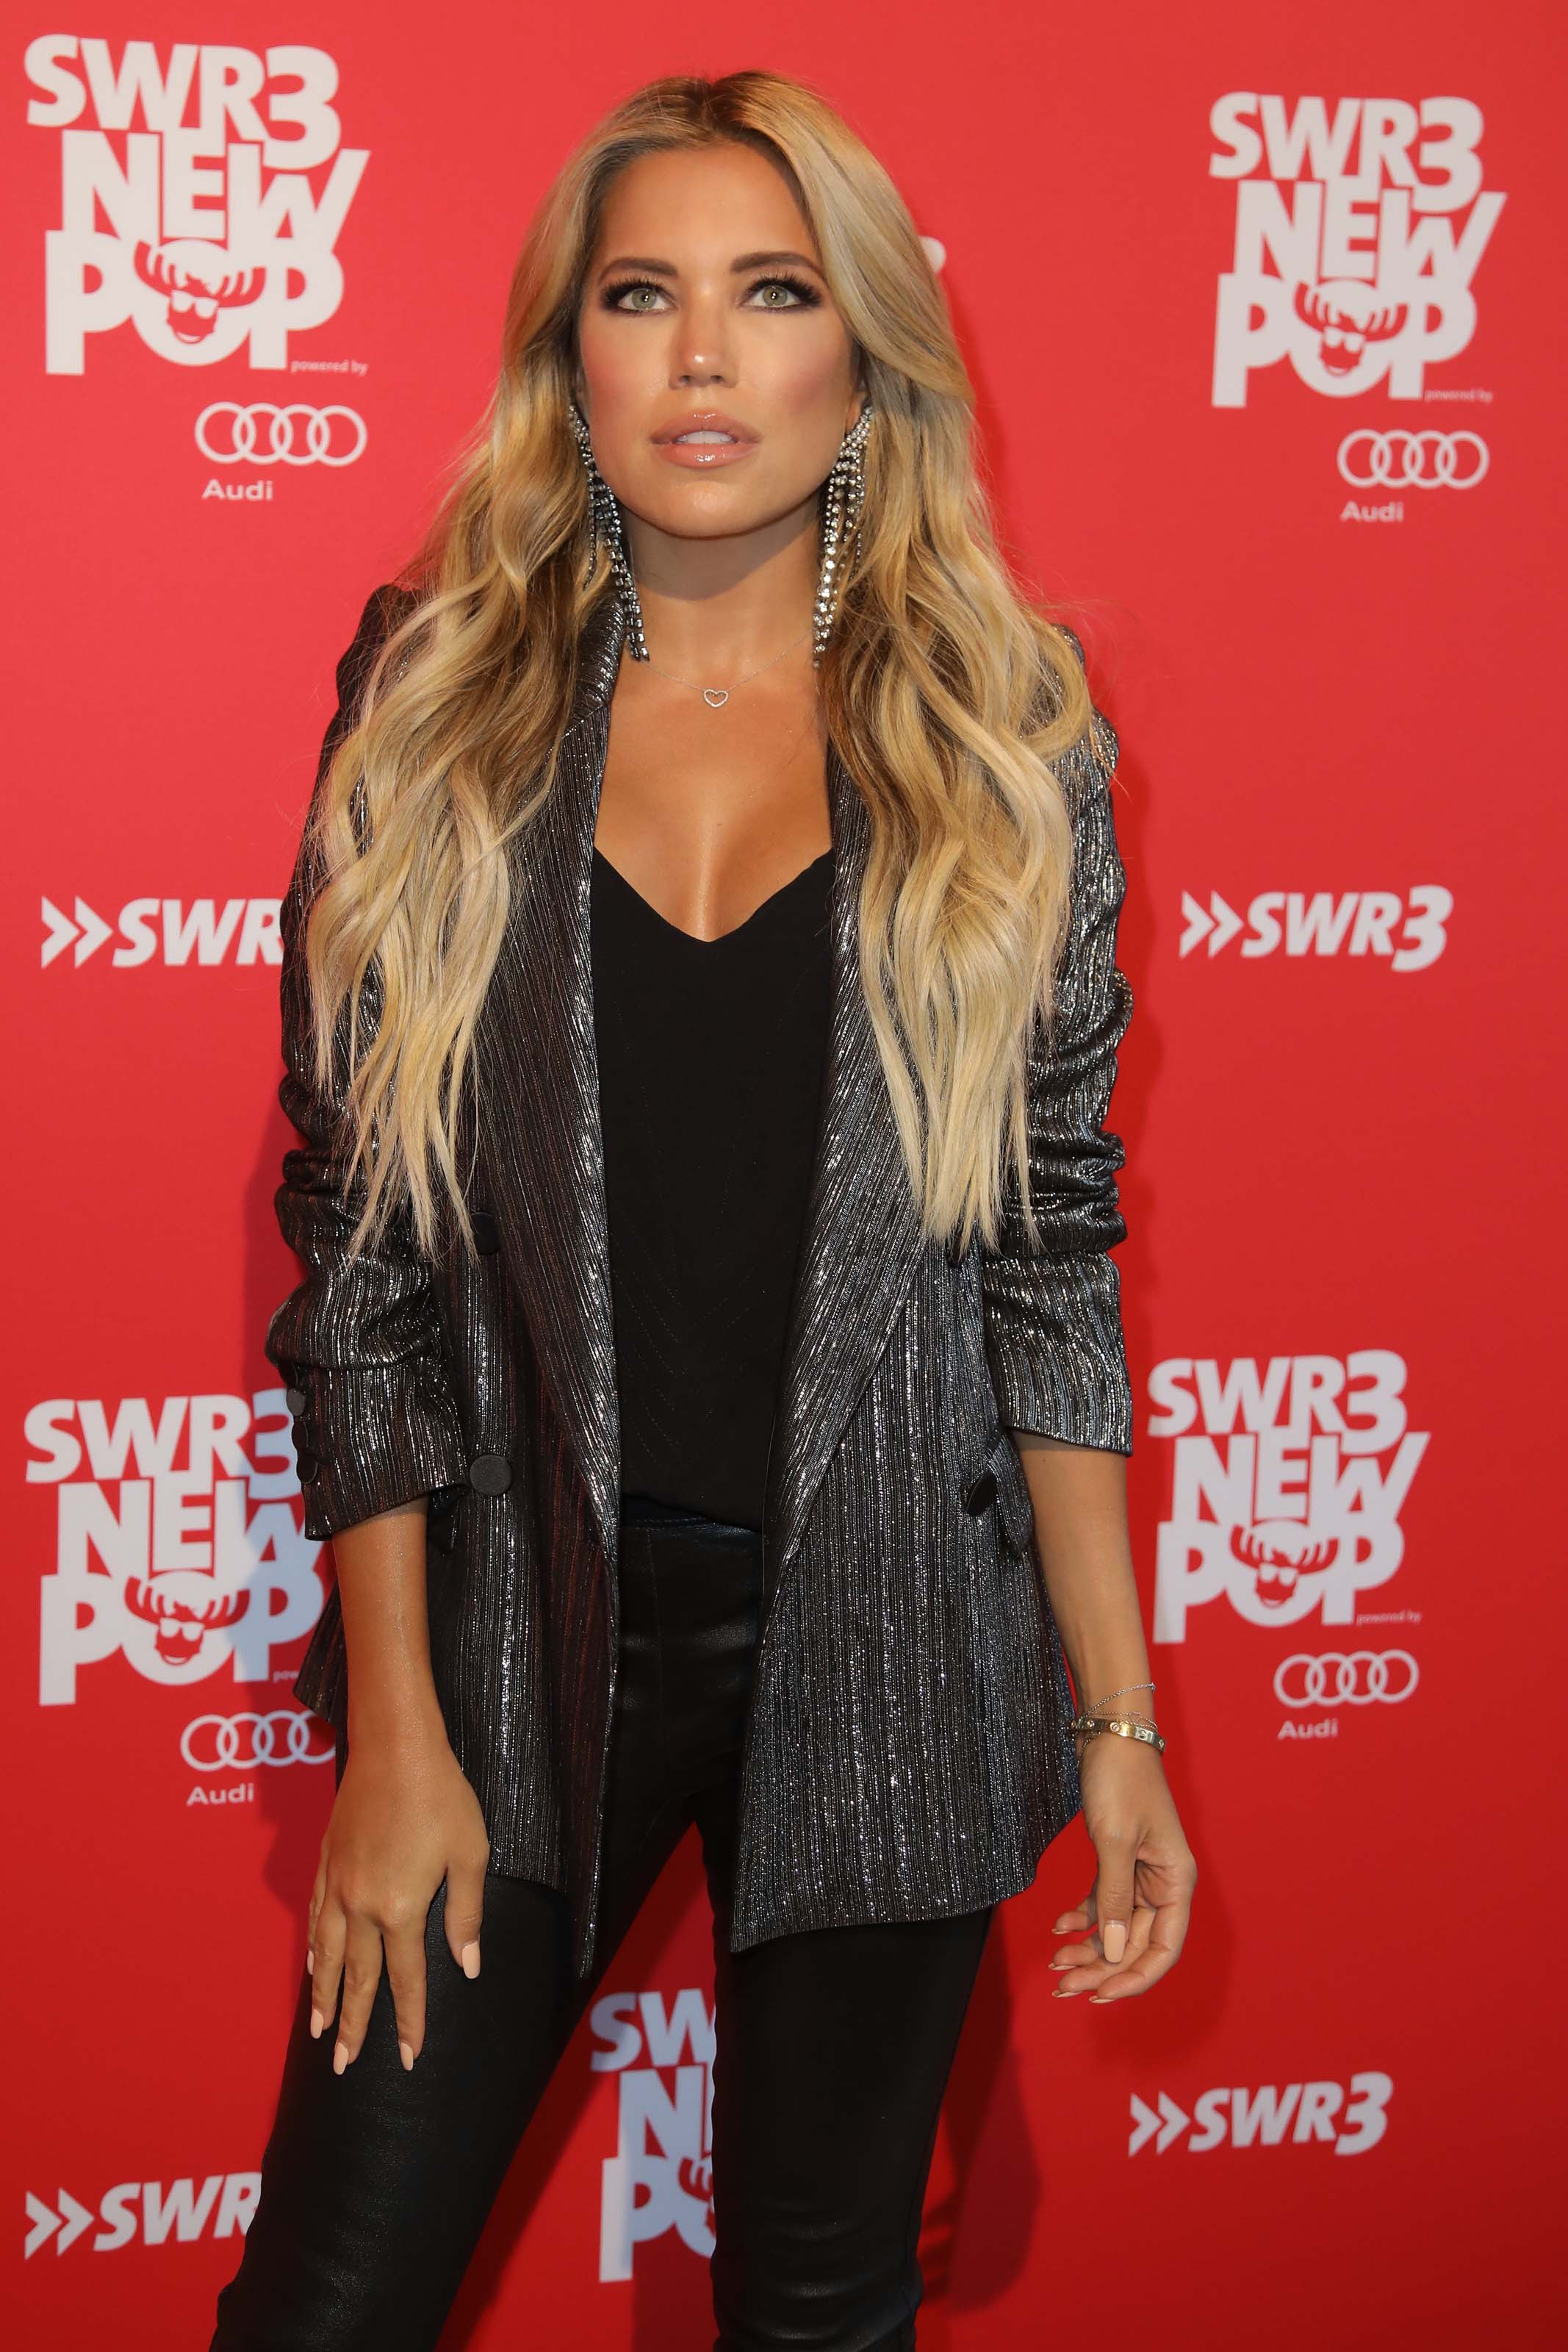 Sylvie Meis attends SWR3 New Pop Festival 'Das Special'